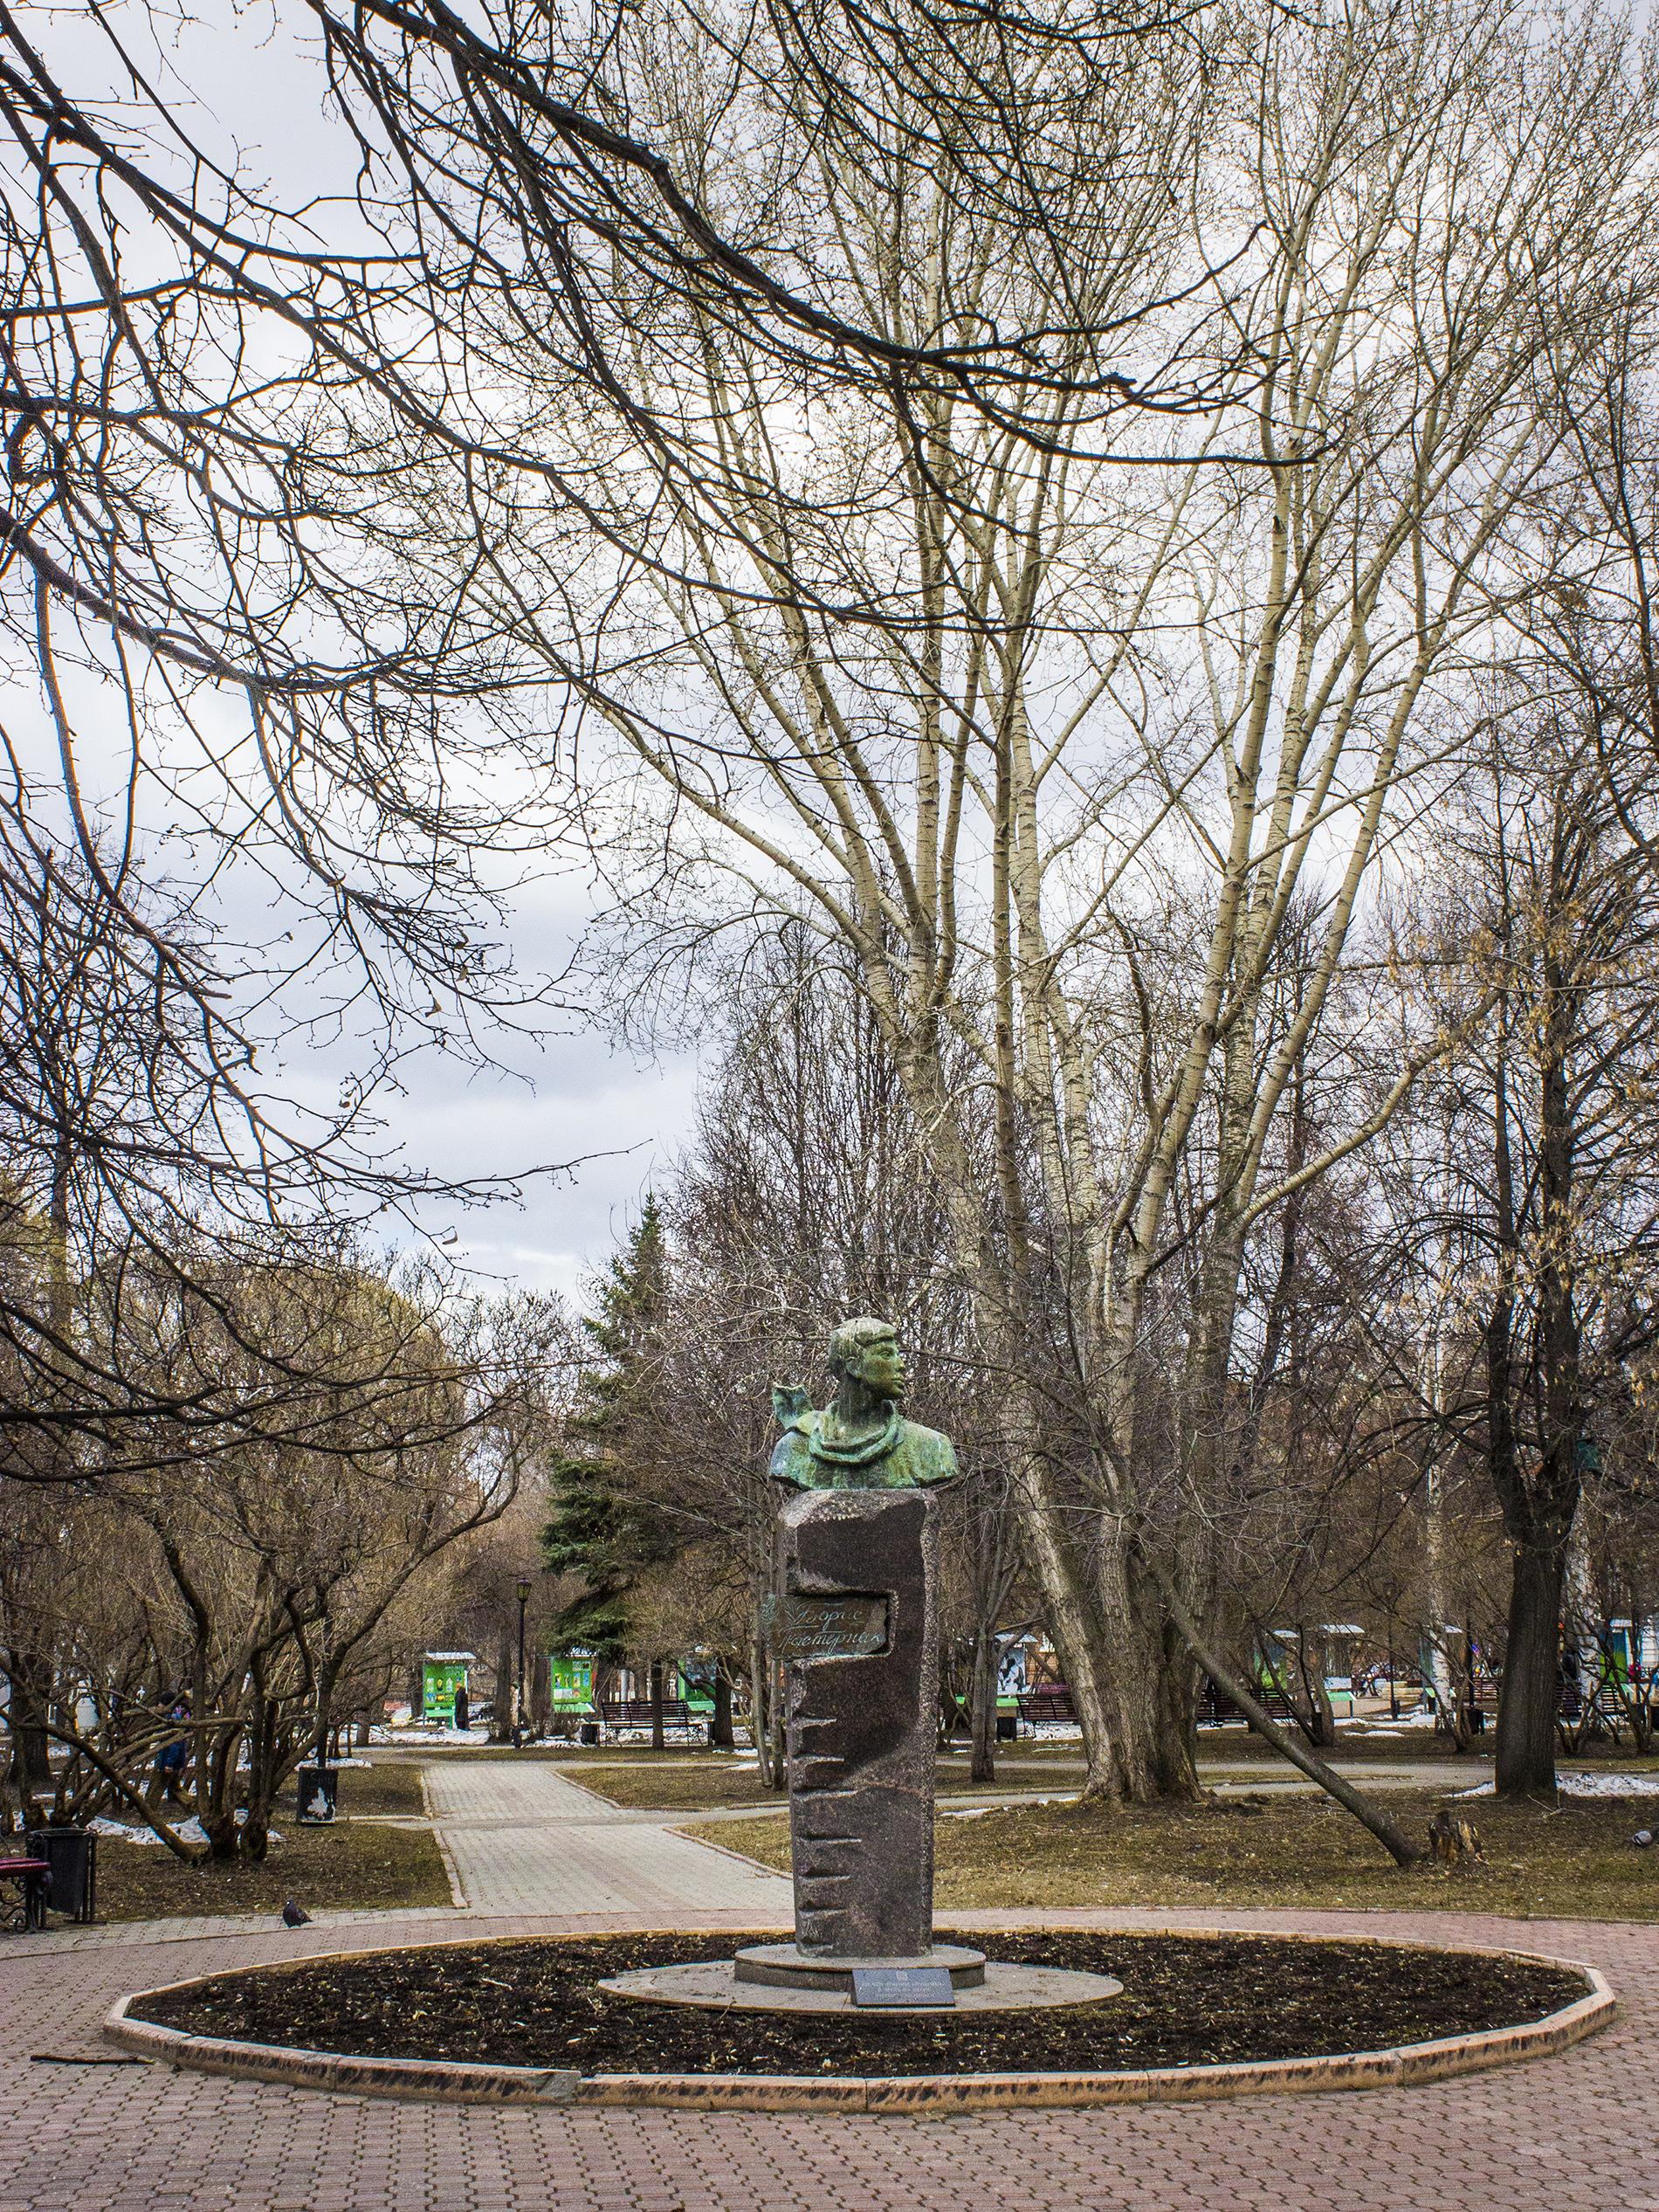 Памятник Борису Пастернаку. Пермь, апрель 2014.